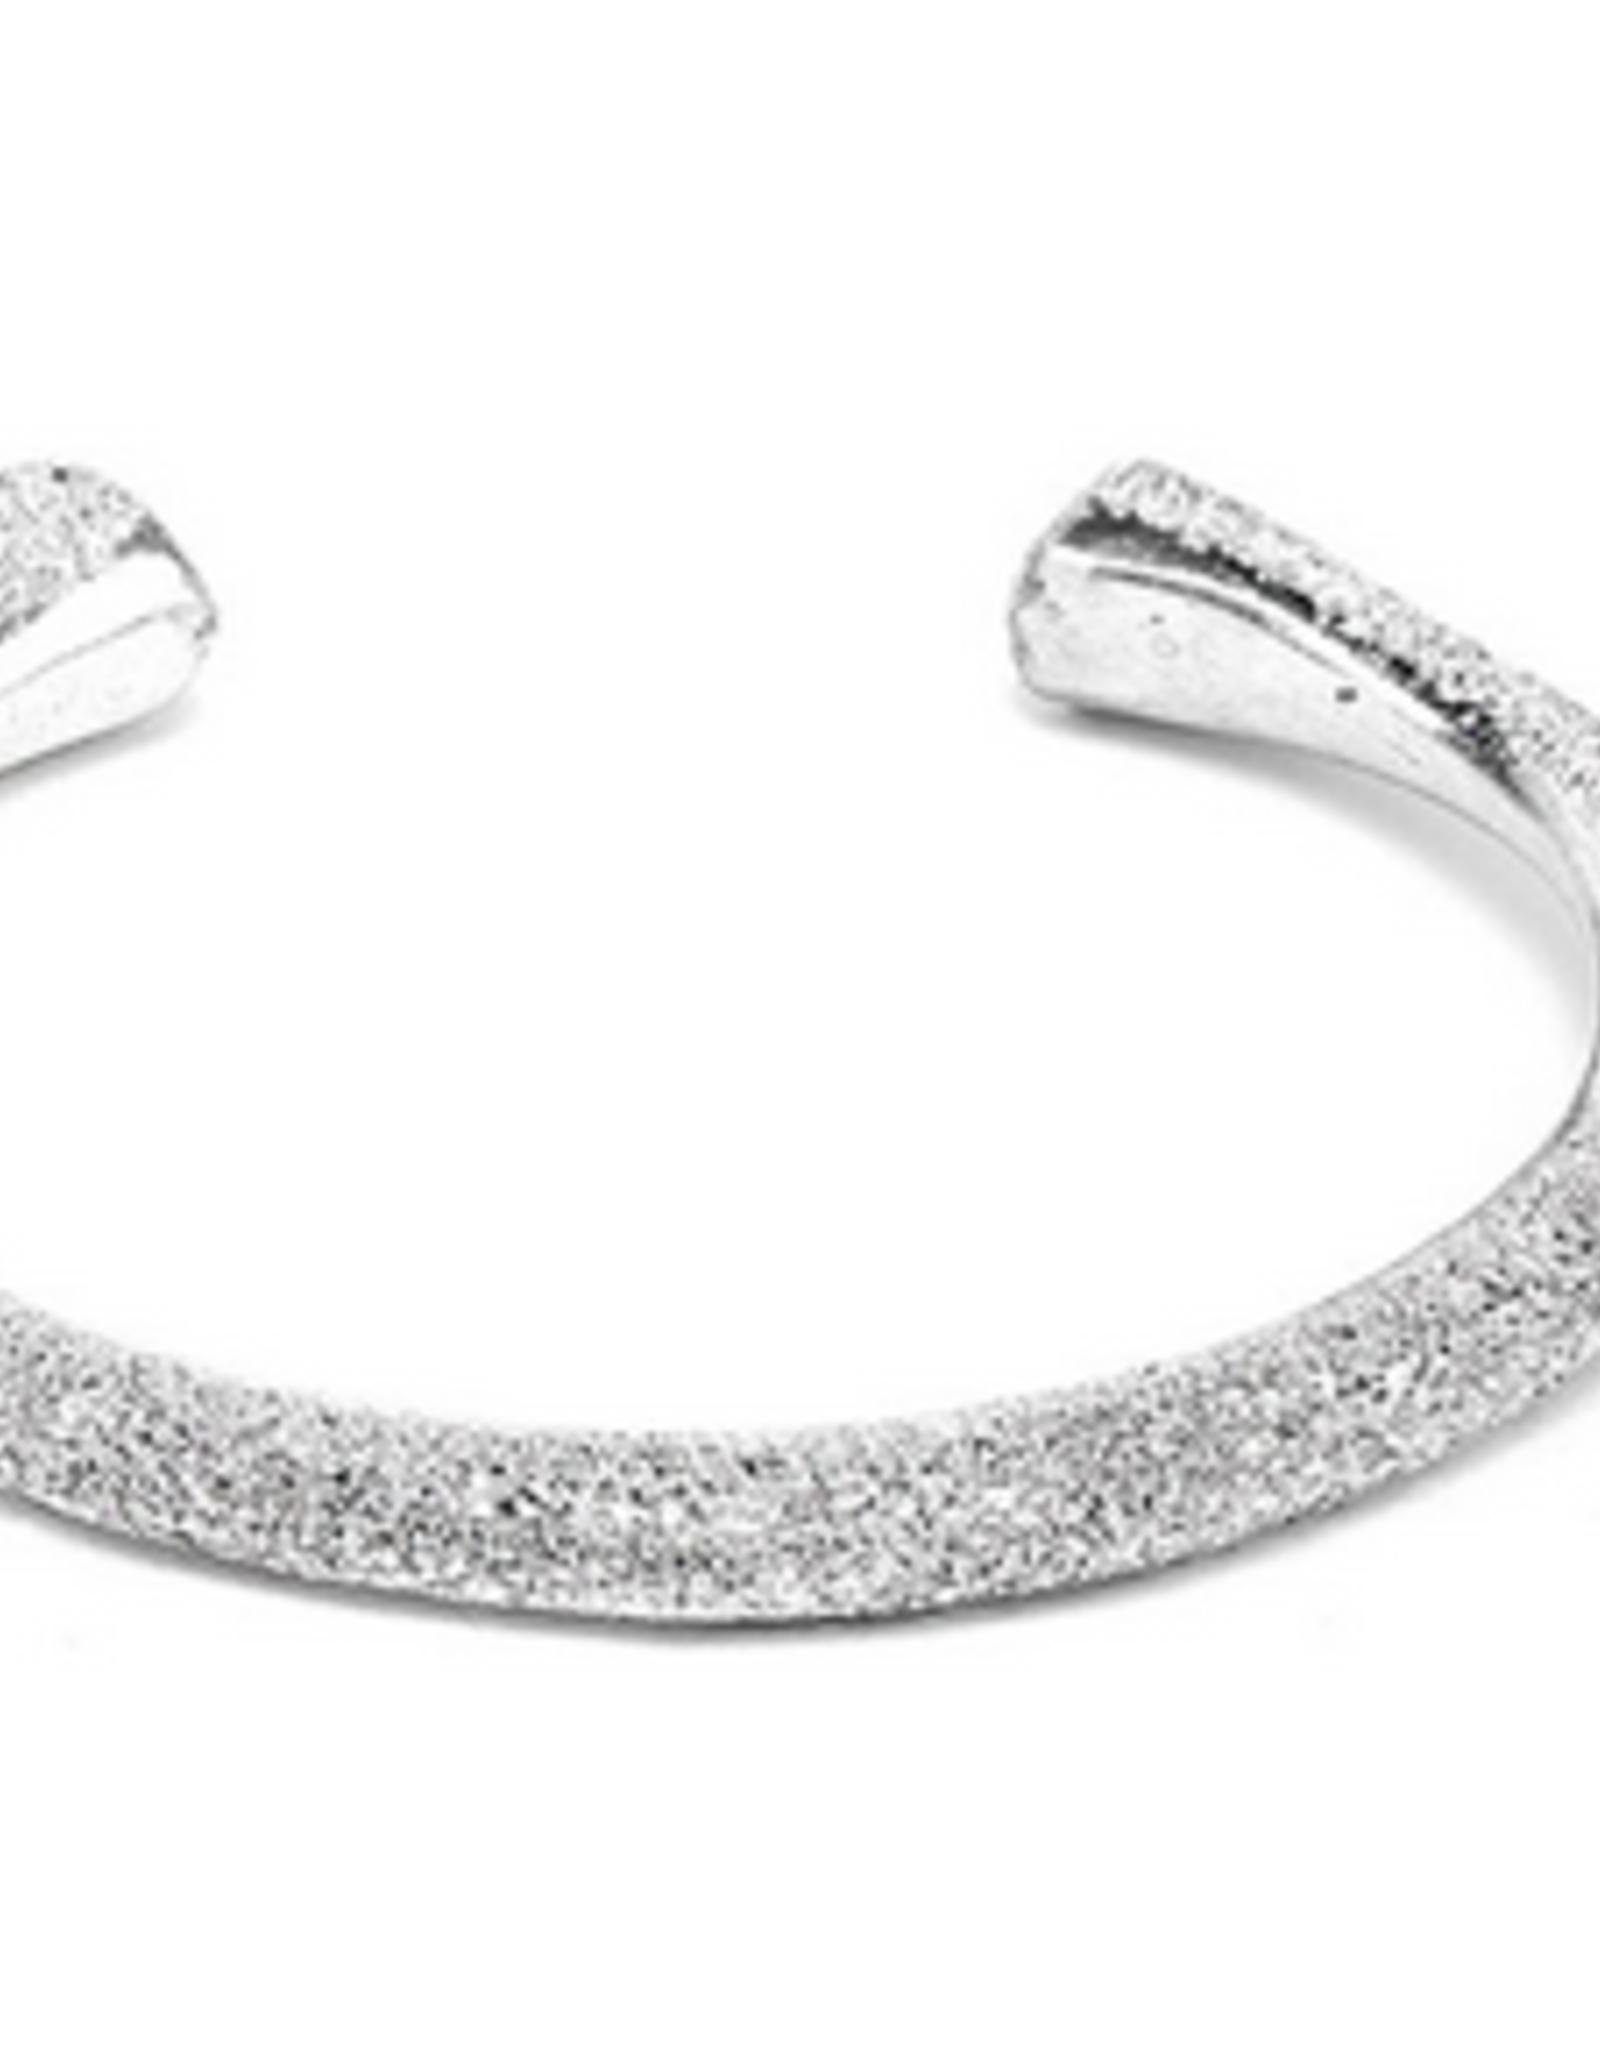 VESTOPAZZO Luces Cuff Bracelet